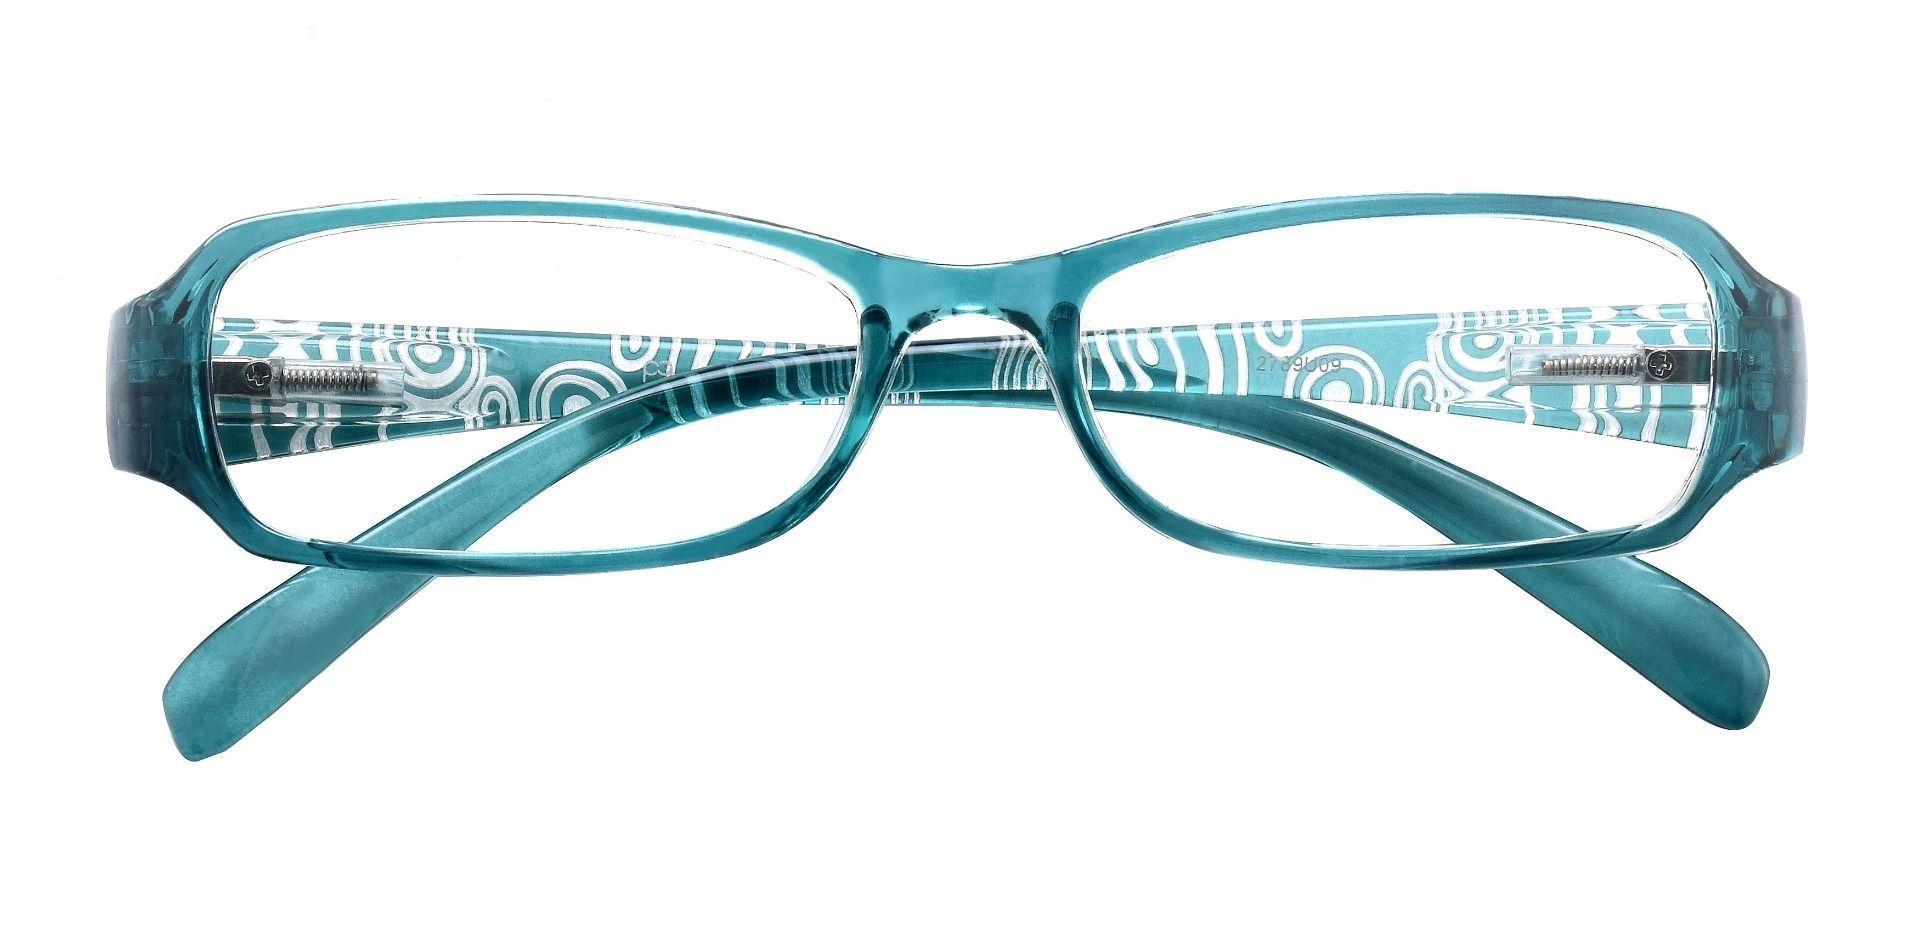 Hobart Rectangle Single Vision Glasses - Blue